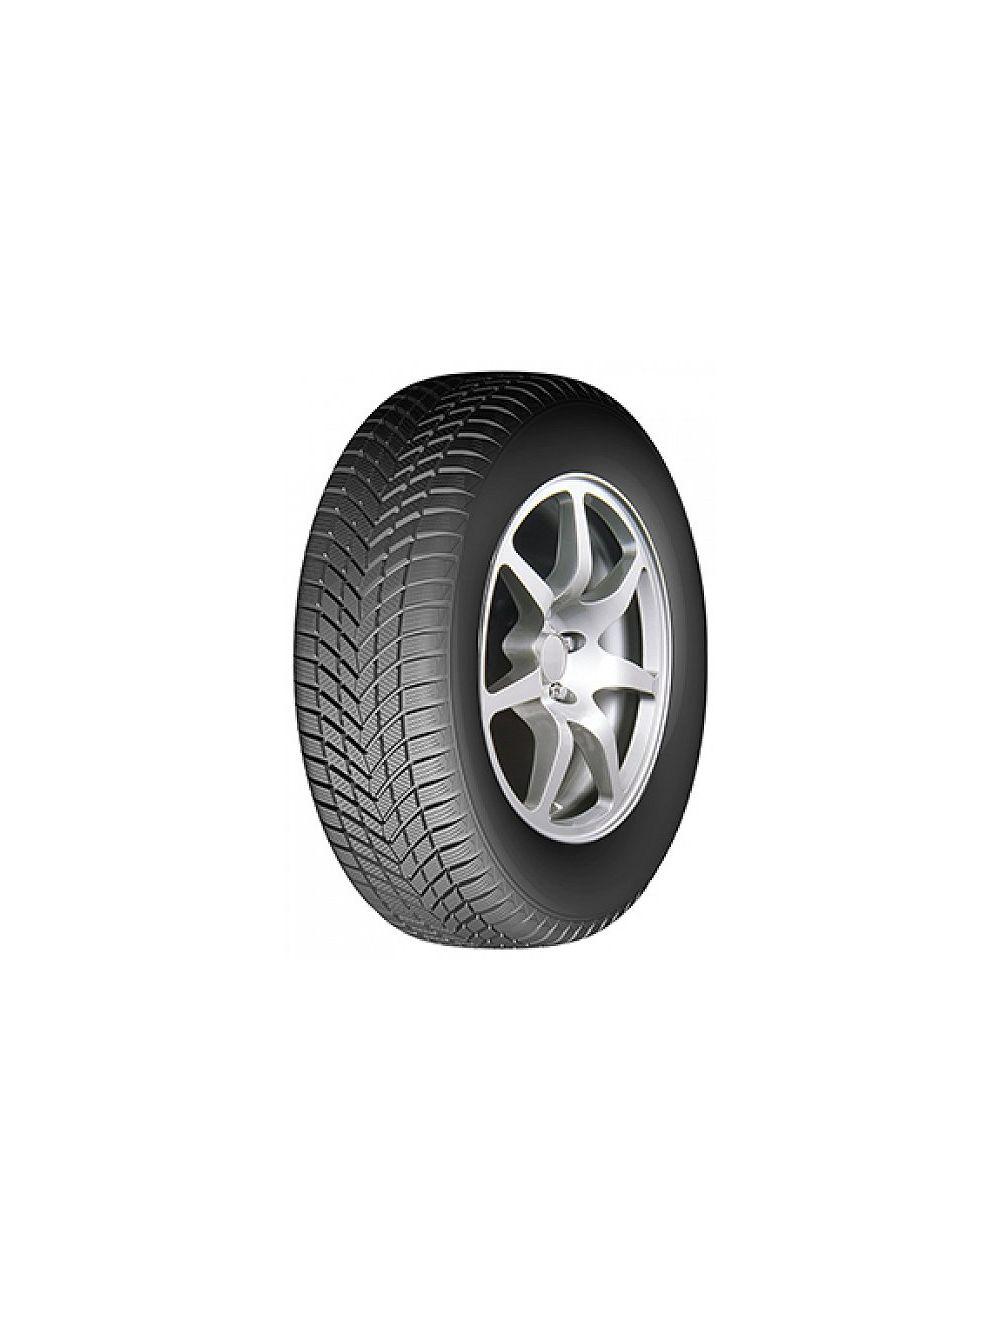 Infinity 165/65R14 T EcoZen Téli gumi